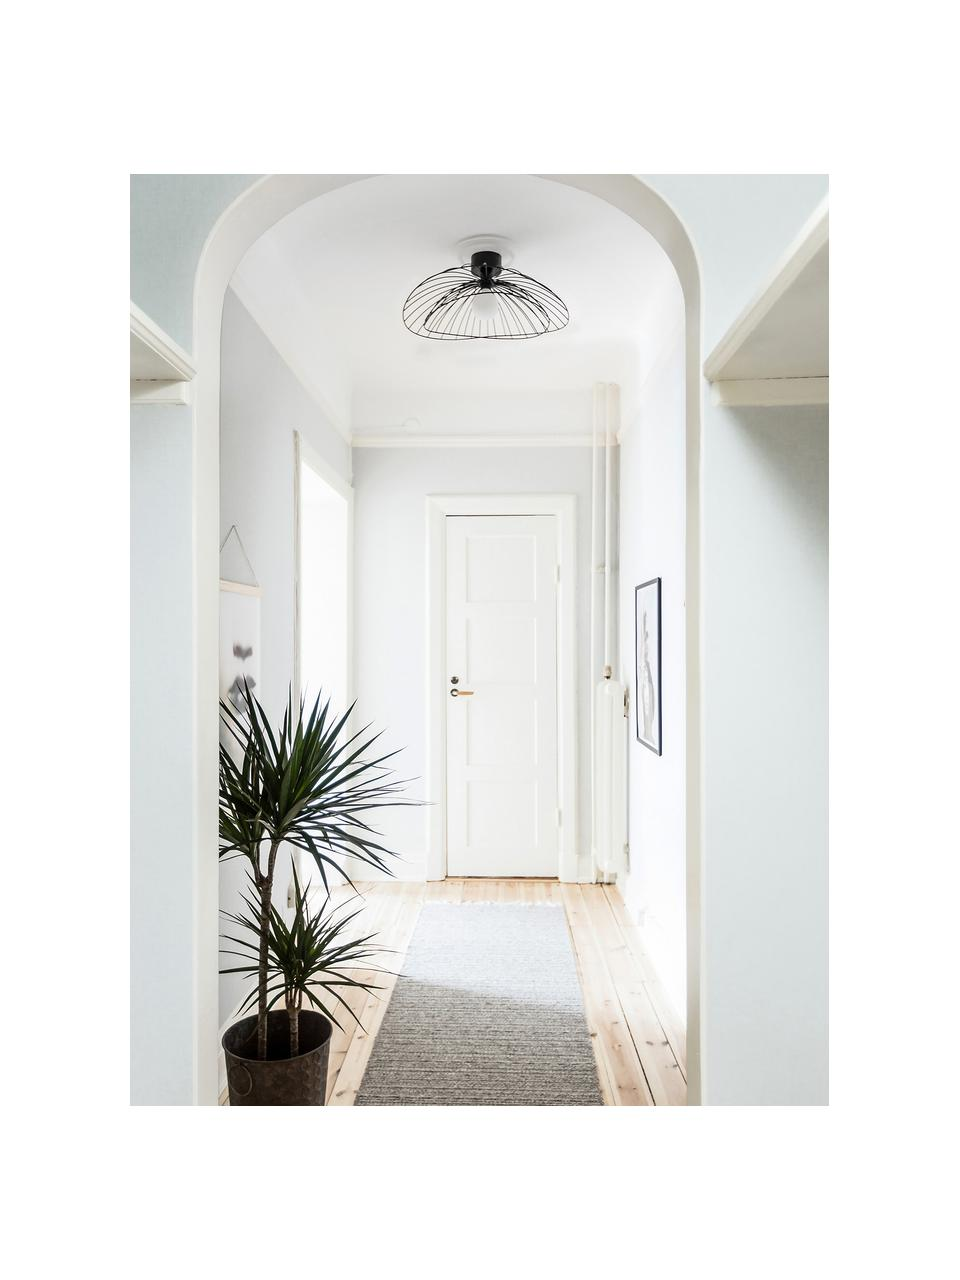 Grote plafond- en wandlamp Ray, Lampenkap: metaal, Zwart, Ø 60 x H 20 cm